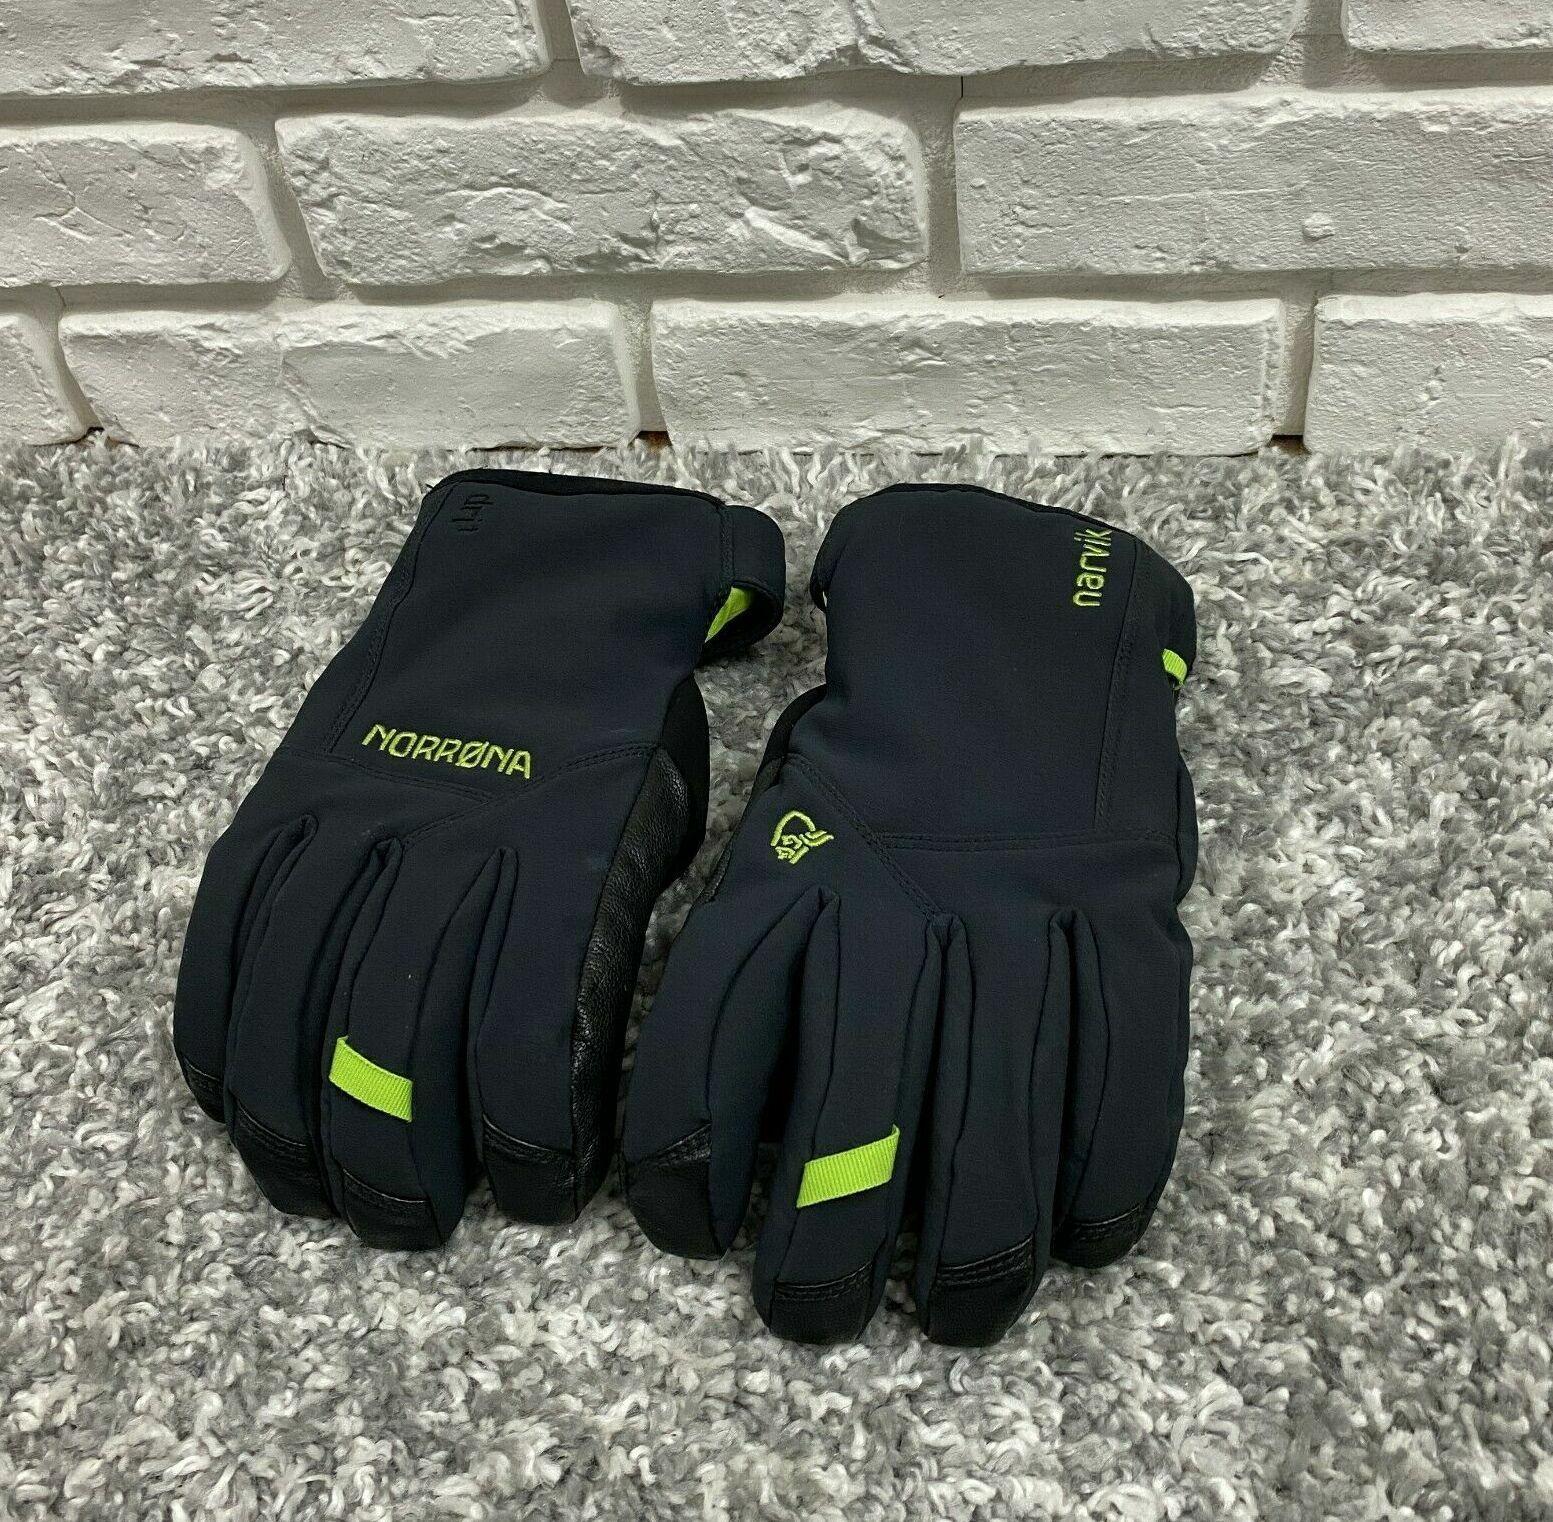 Norrona NARVIK DRI1 Insulated Short Gloves Caviar Black Green Size L Winter